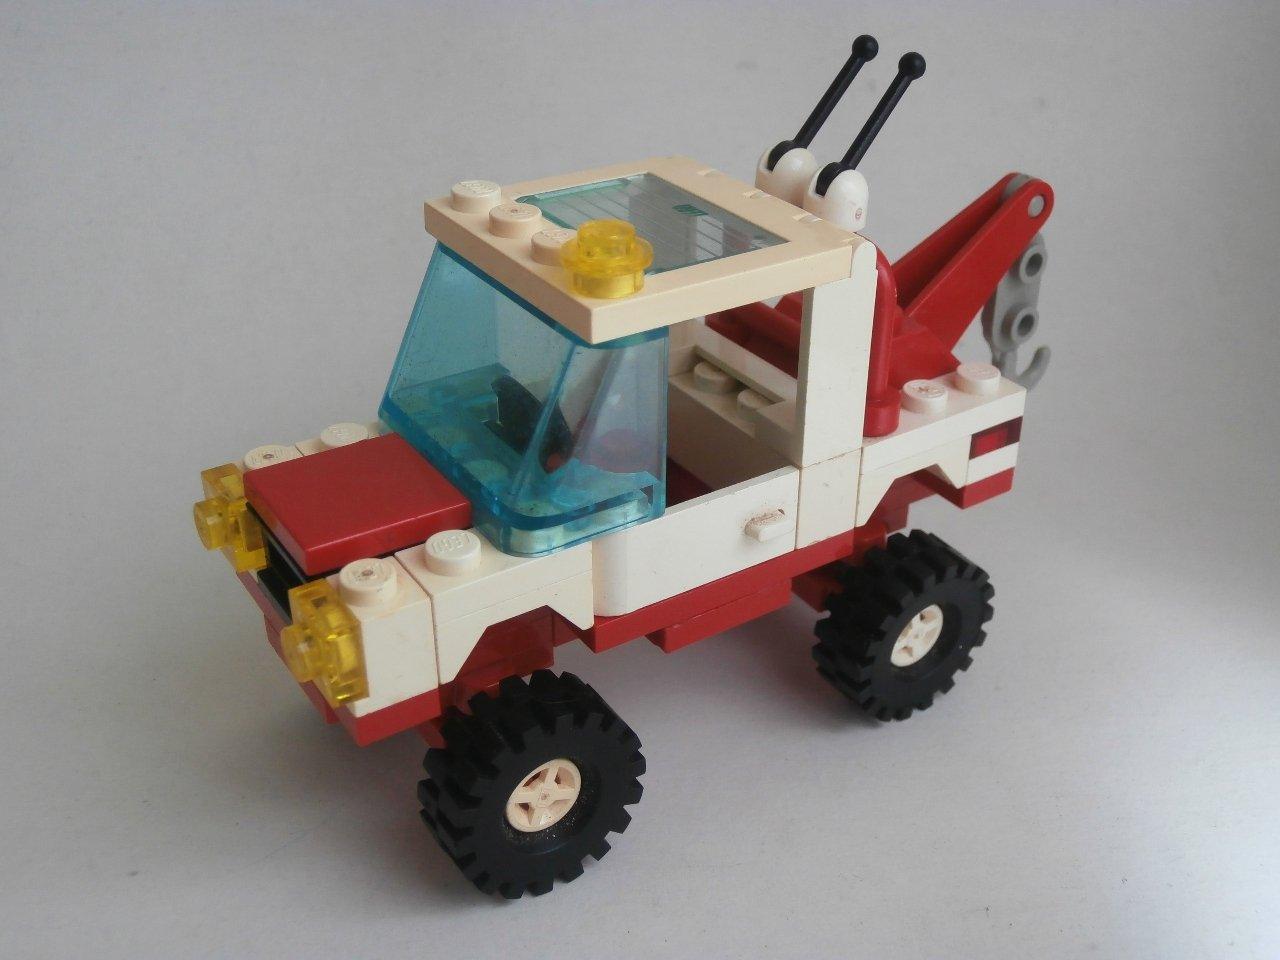 Lego System Town 6660-1 Hook & Haul Wrecker 1989